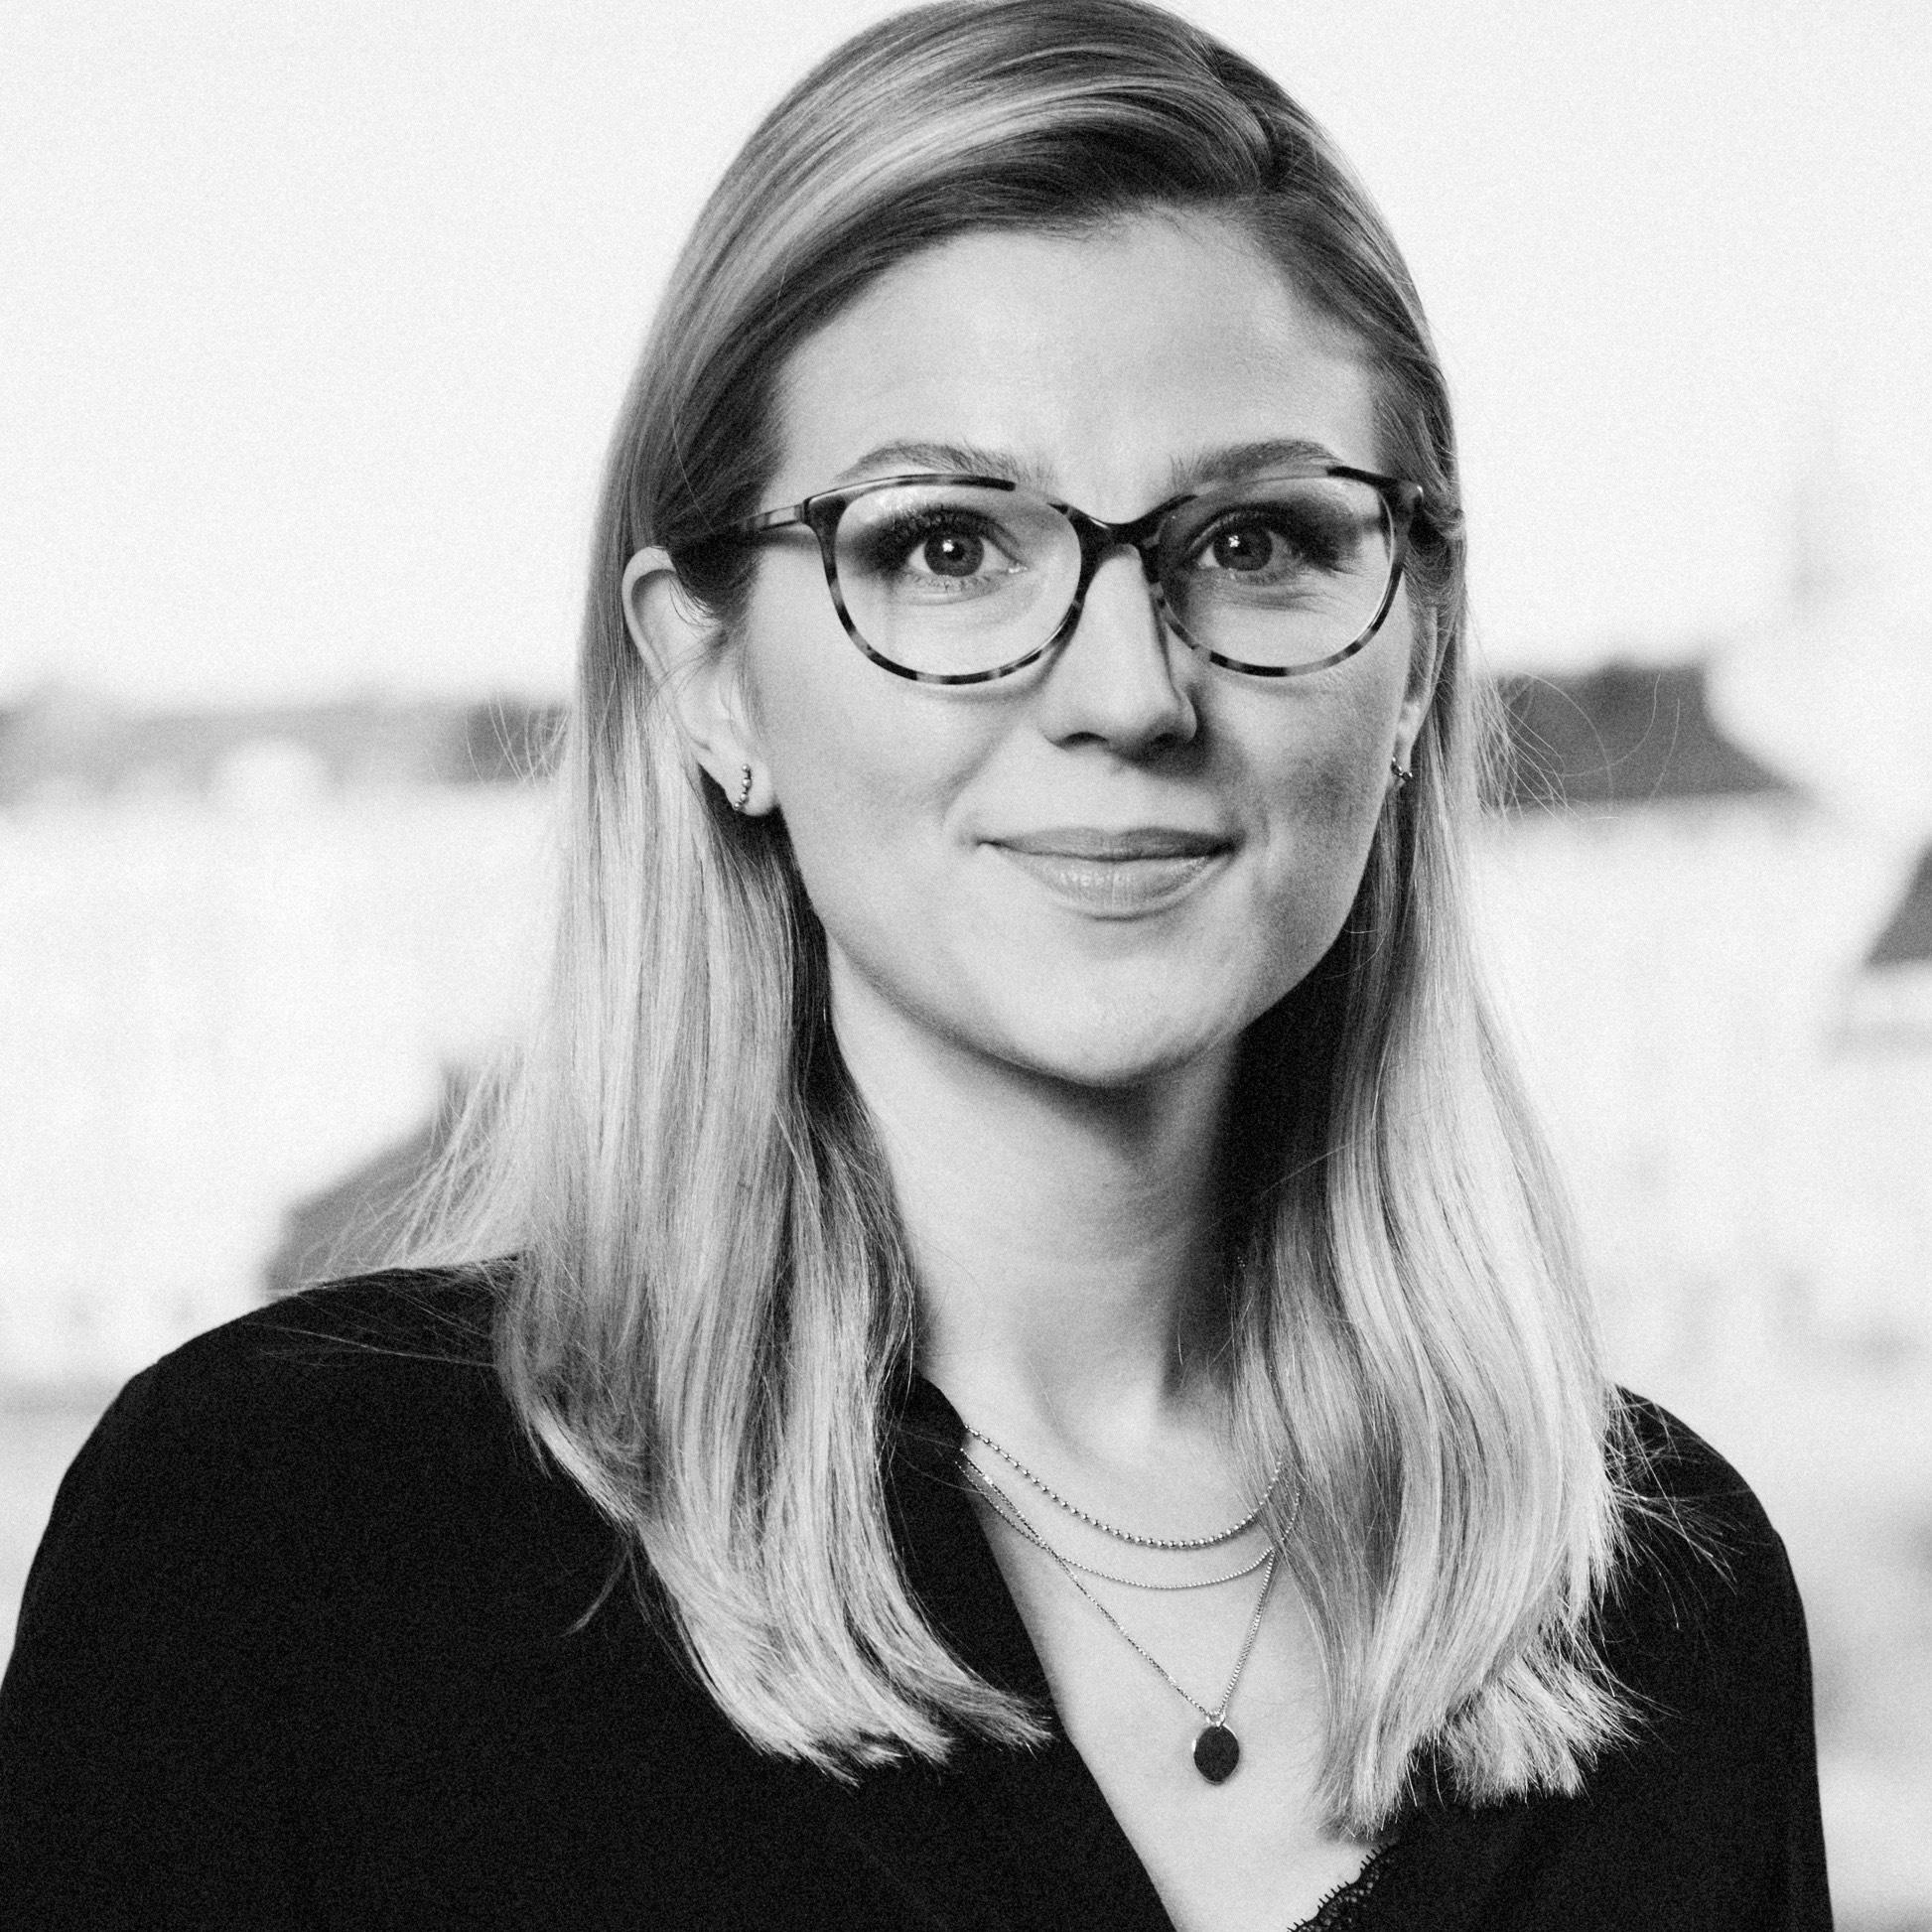 Anna Degerfeldt